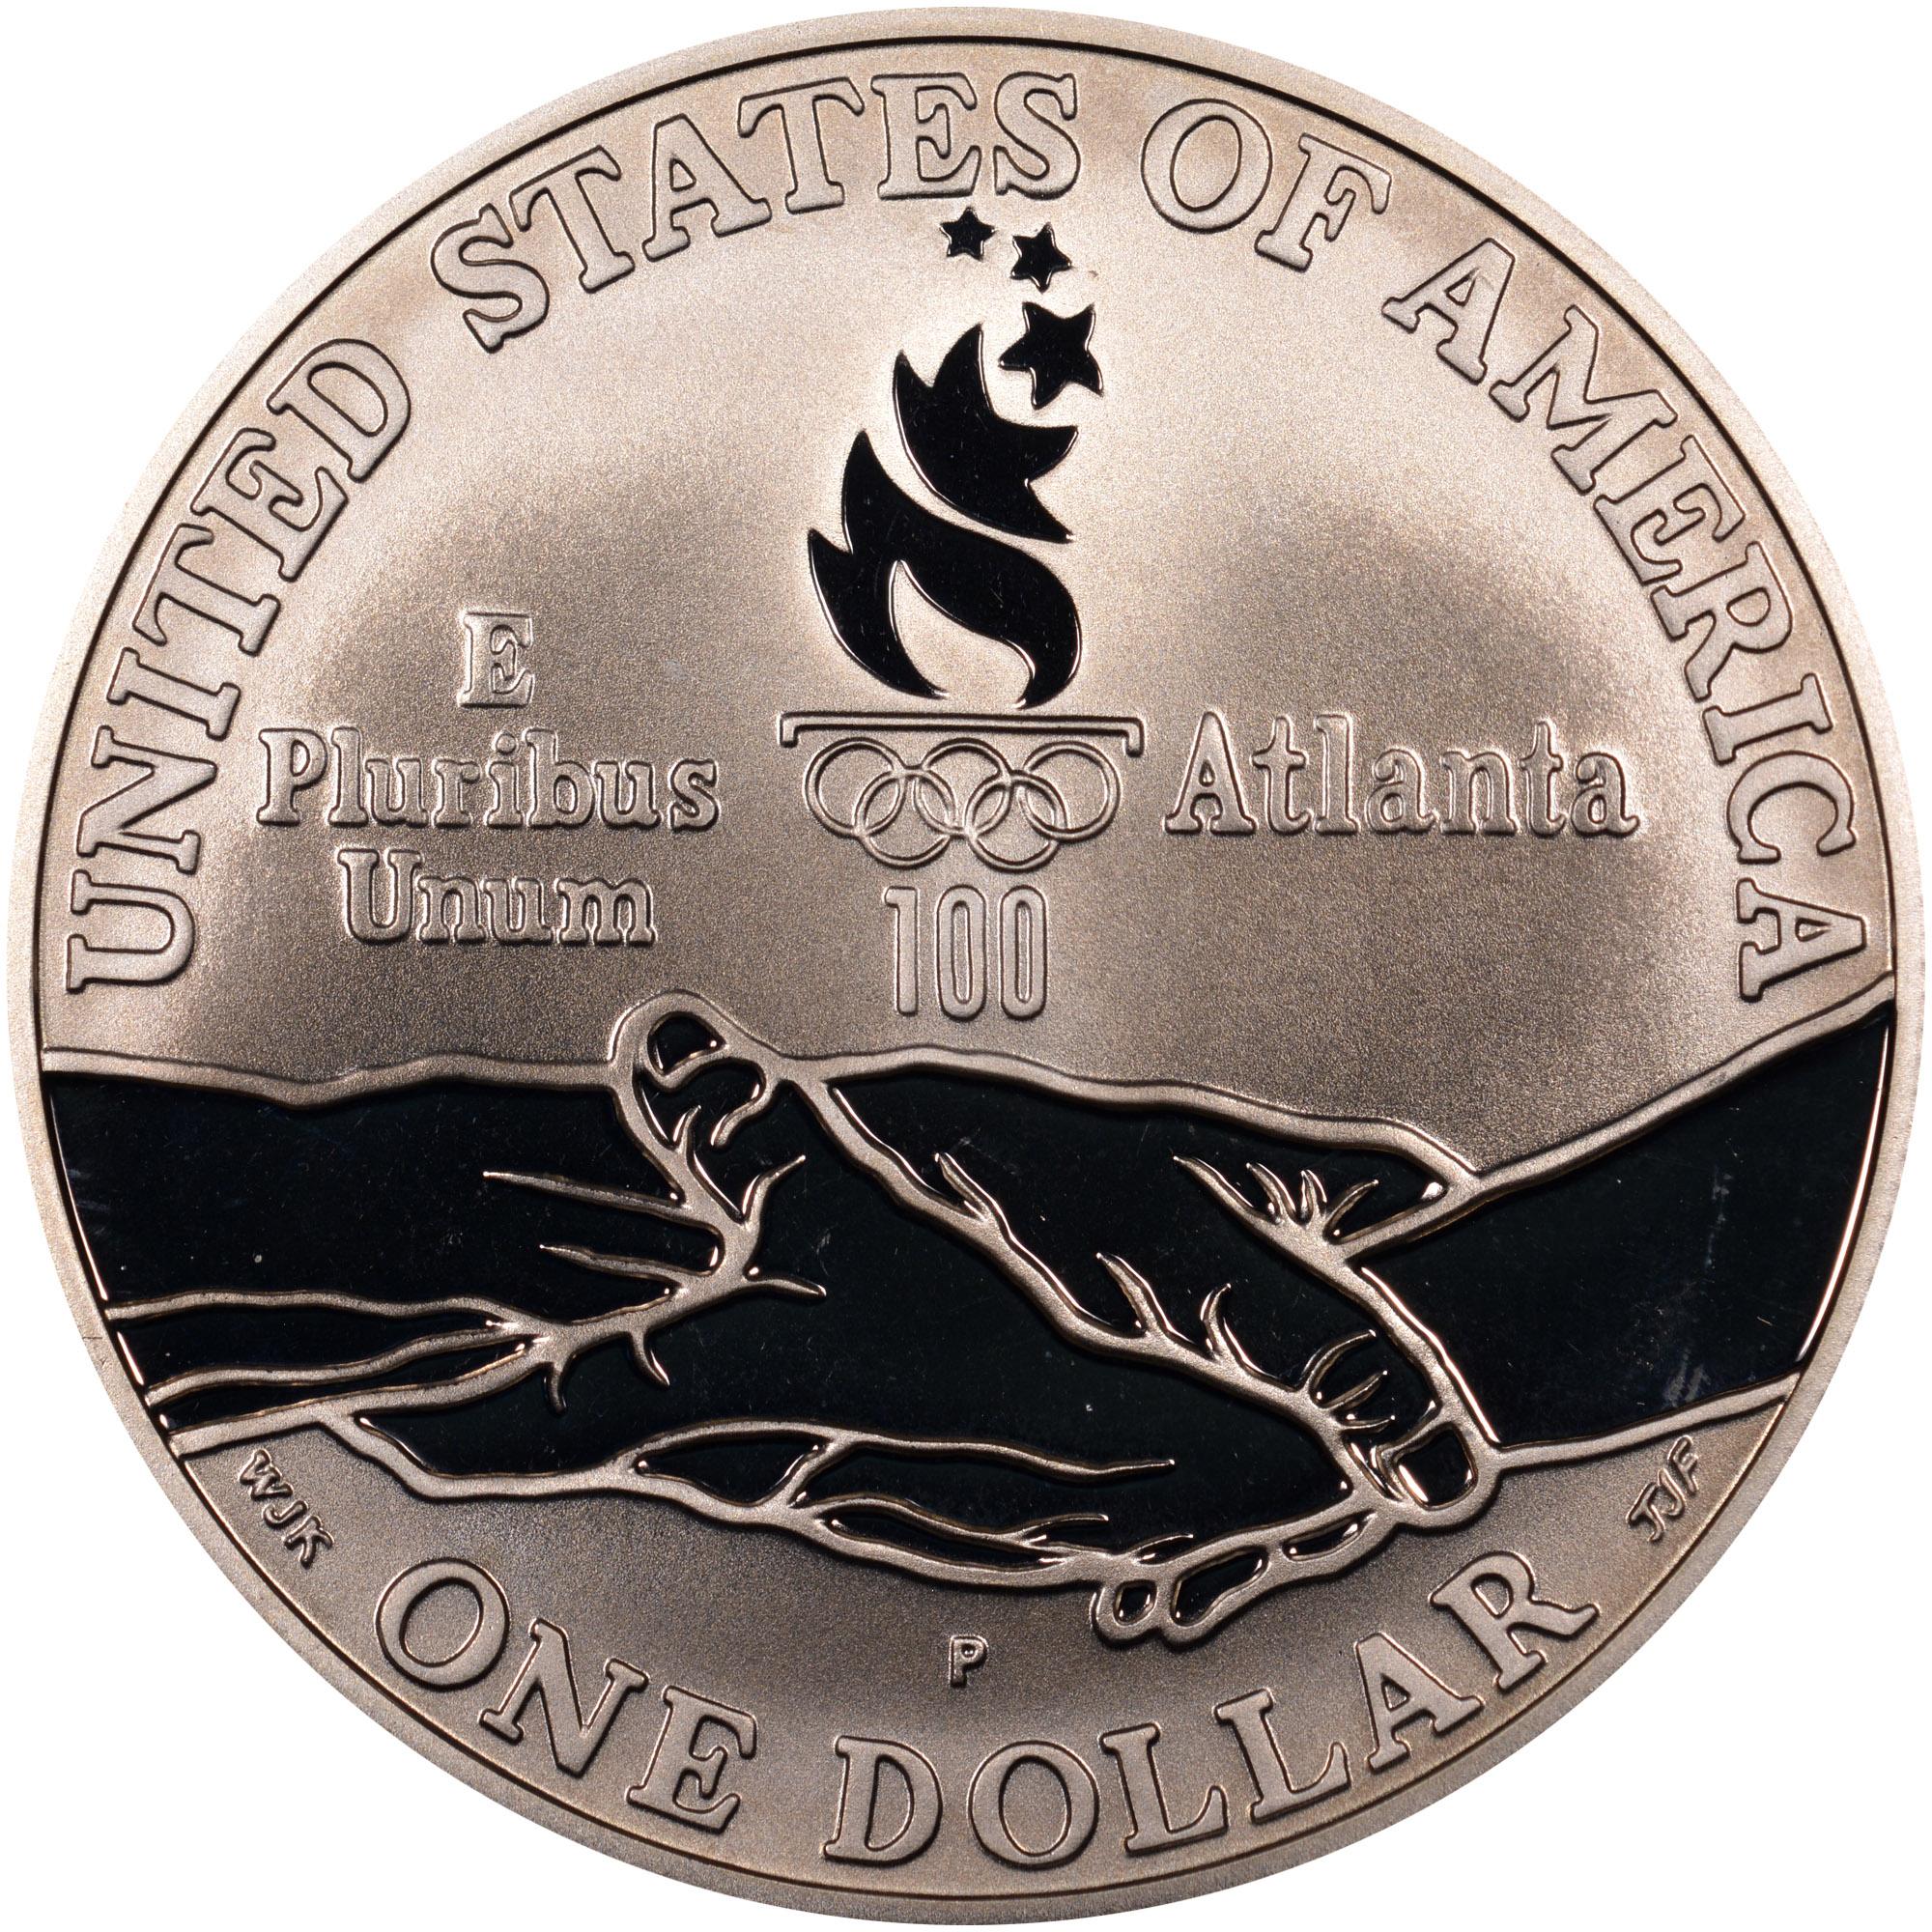 1995 Paralympics Blind Runner Commemorative Silver Dollar NGC PF 69 Ultra Cameo